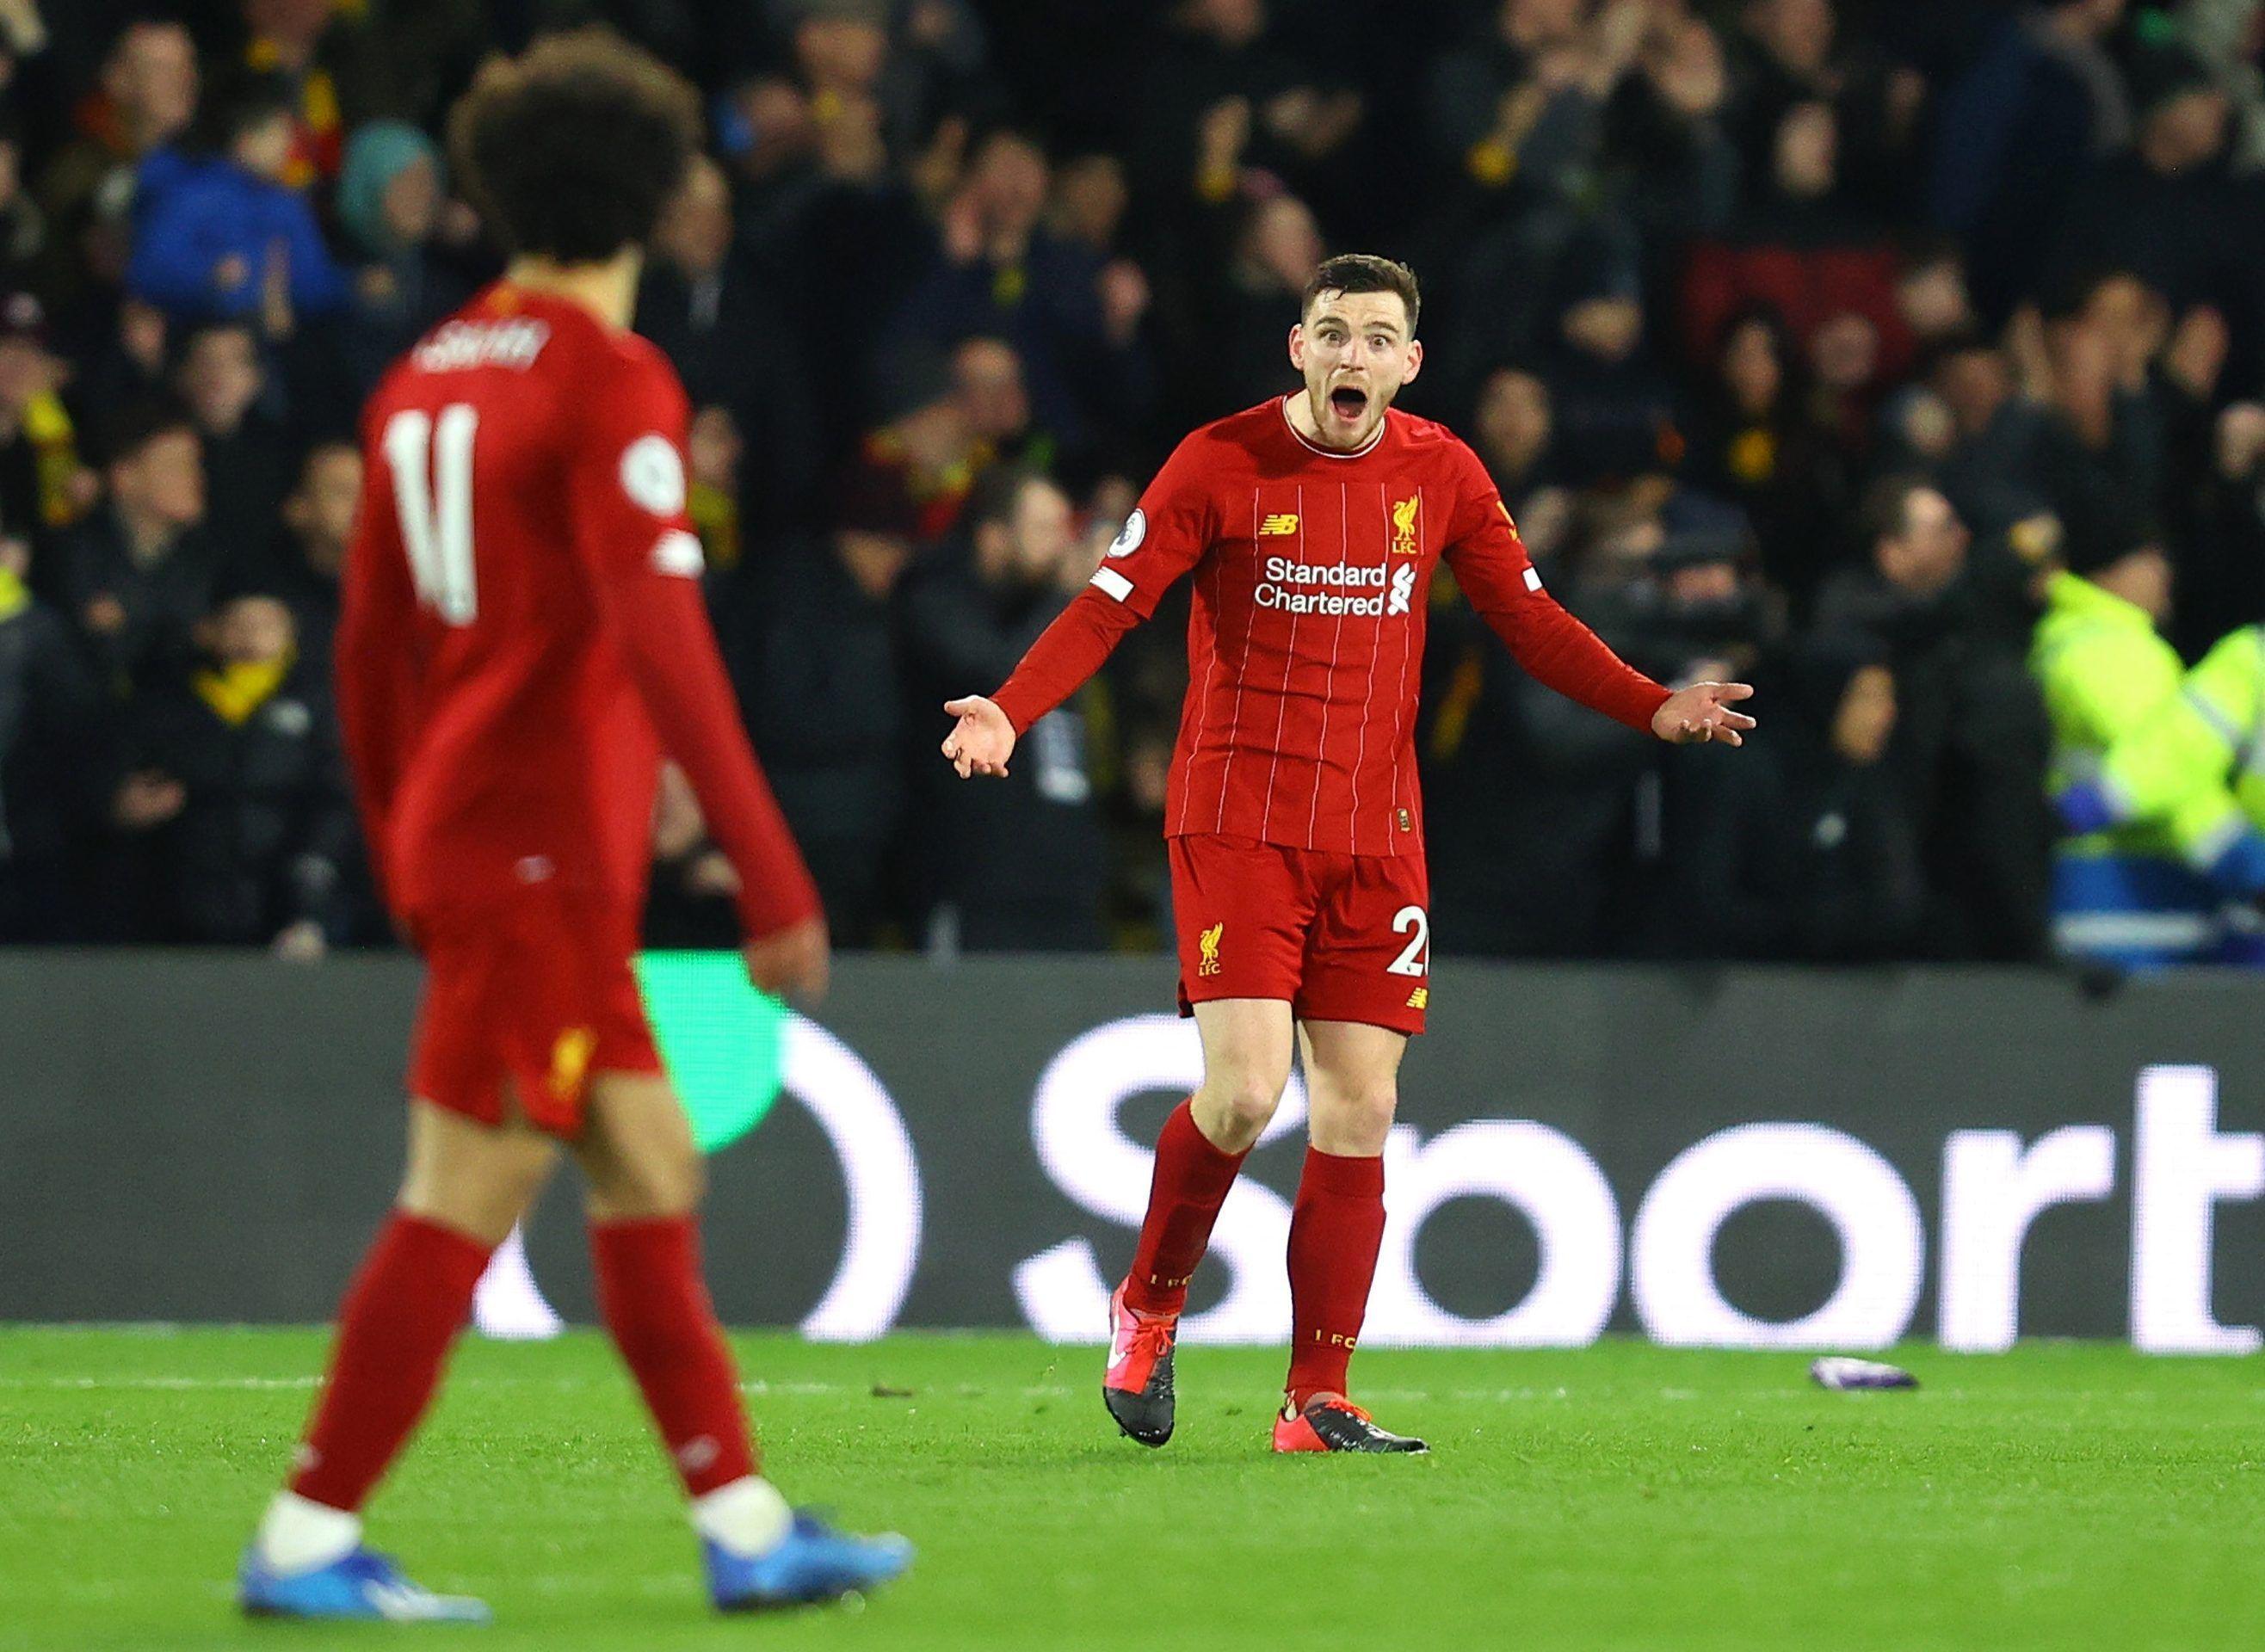 Liverpool vs bournemouth free live stream tv channel